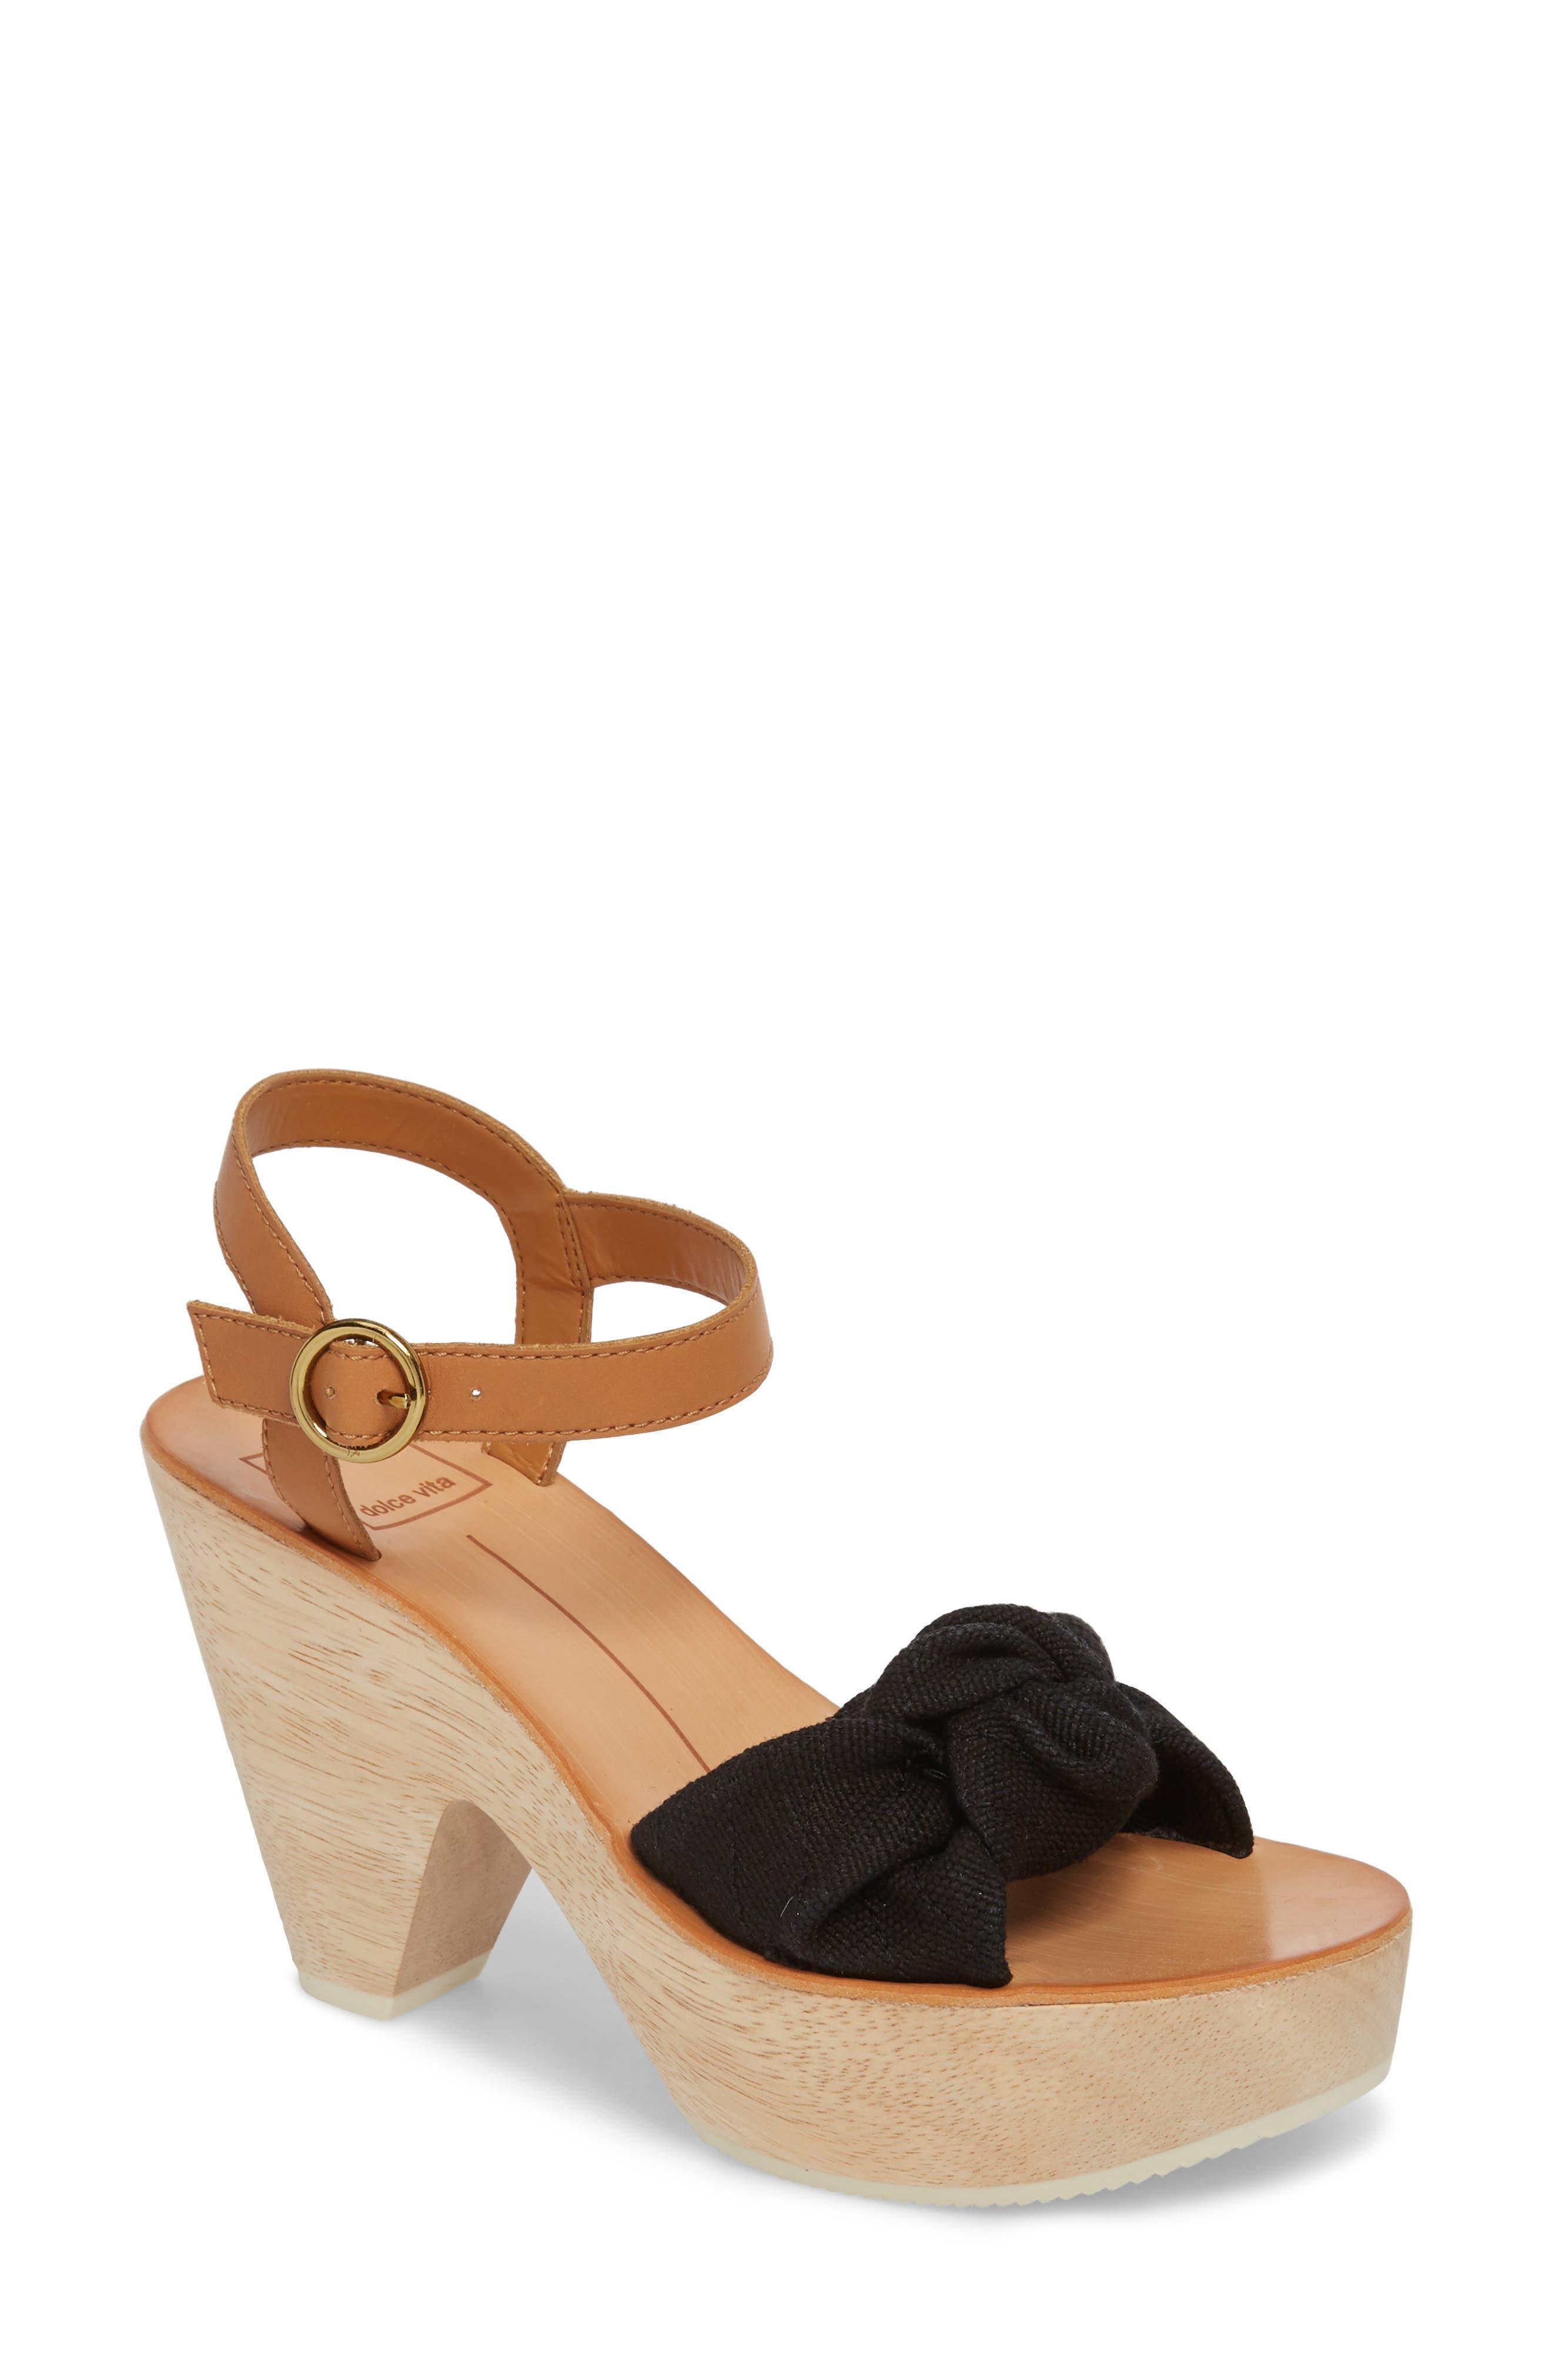 Shia Knotted Platform Sandal,                         Main,                         color, 001